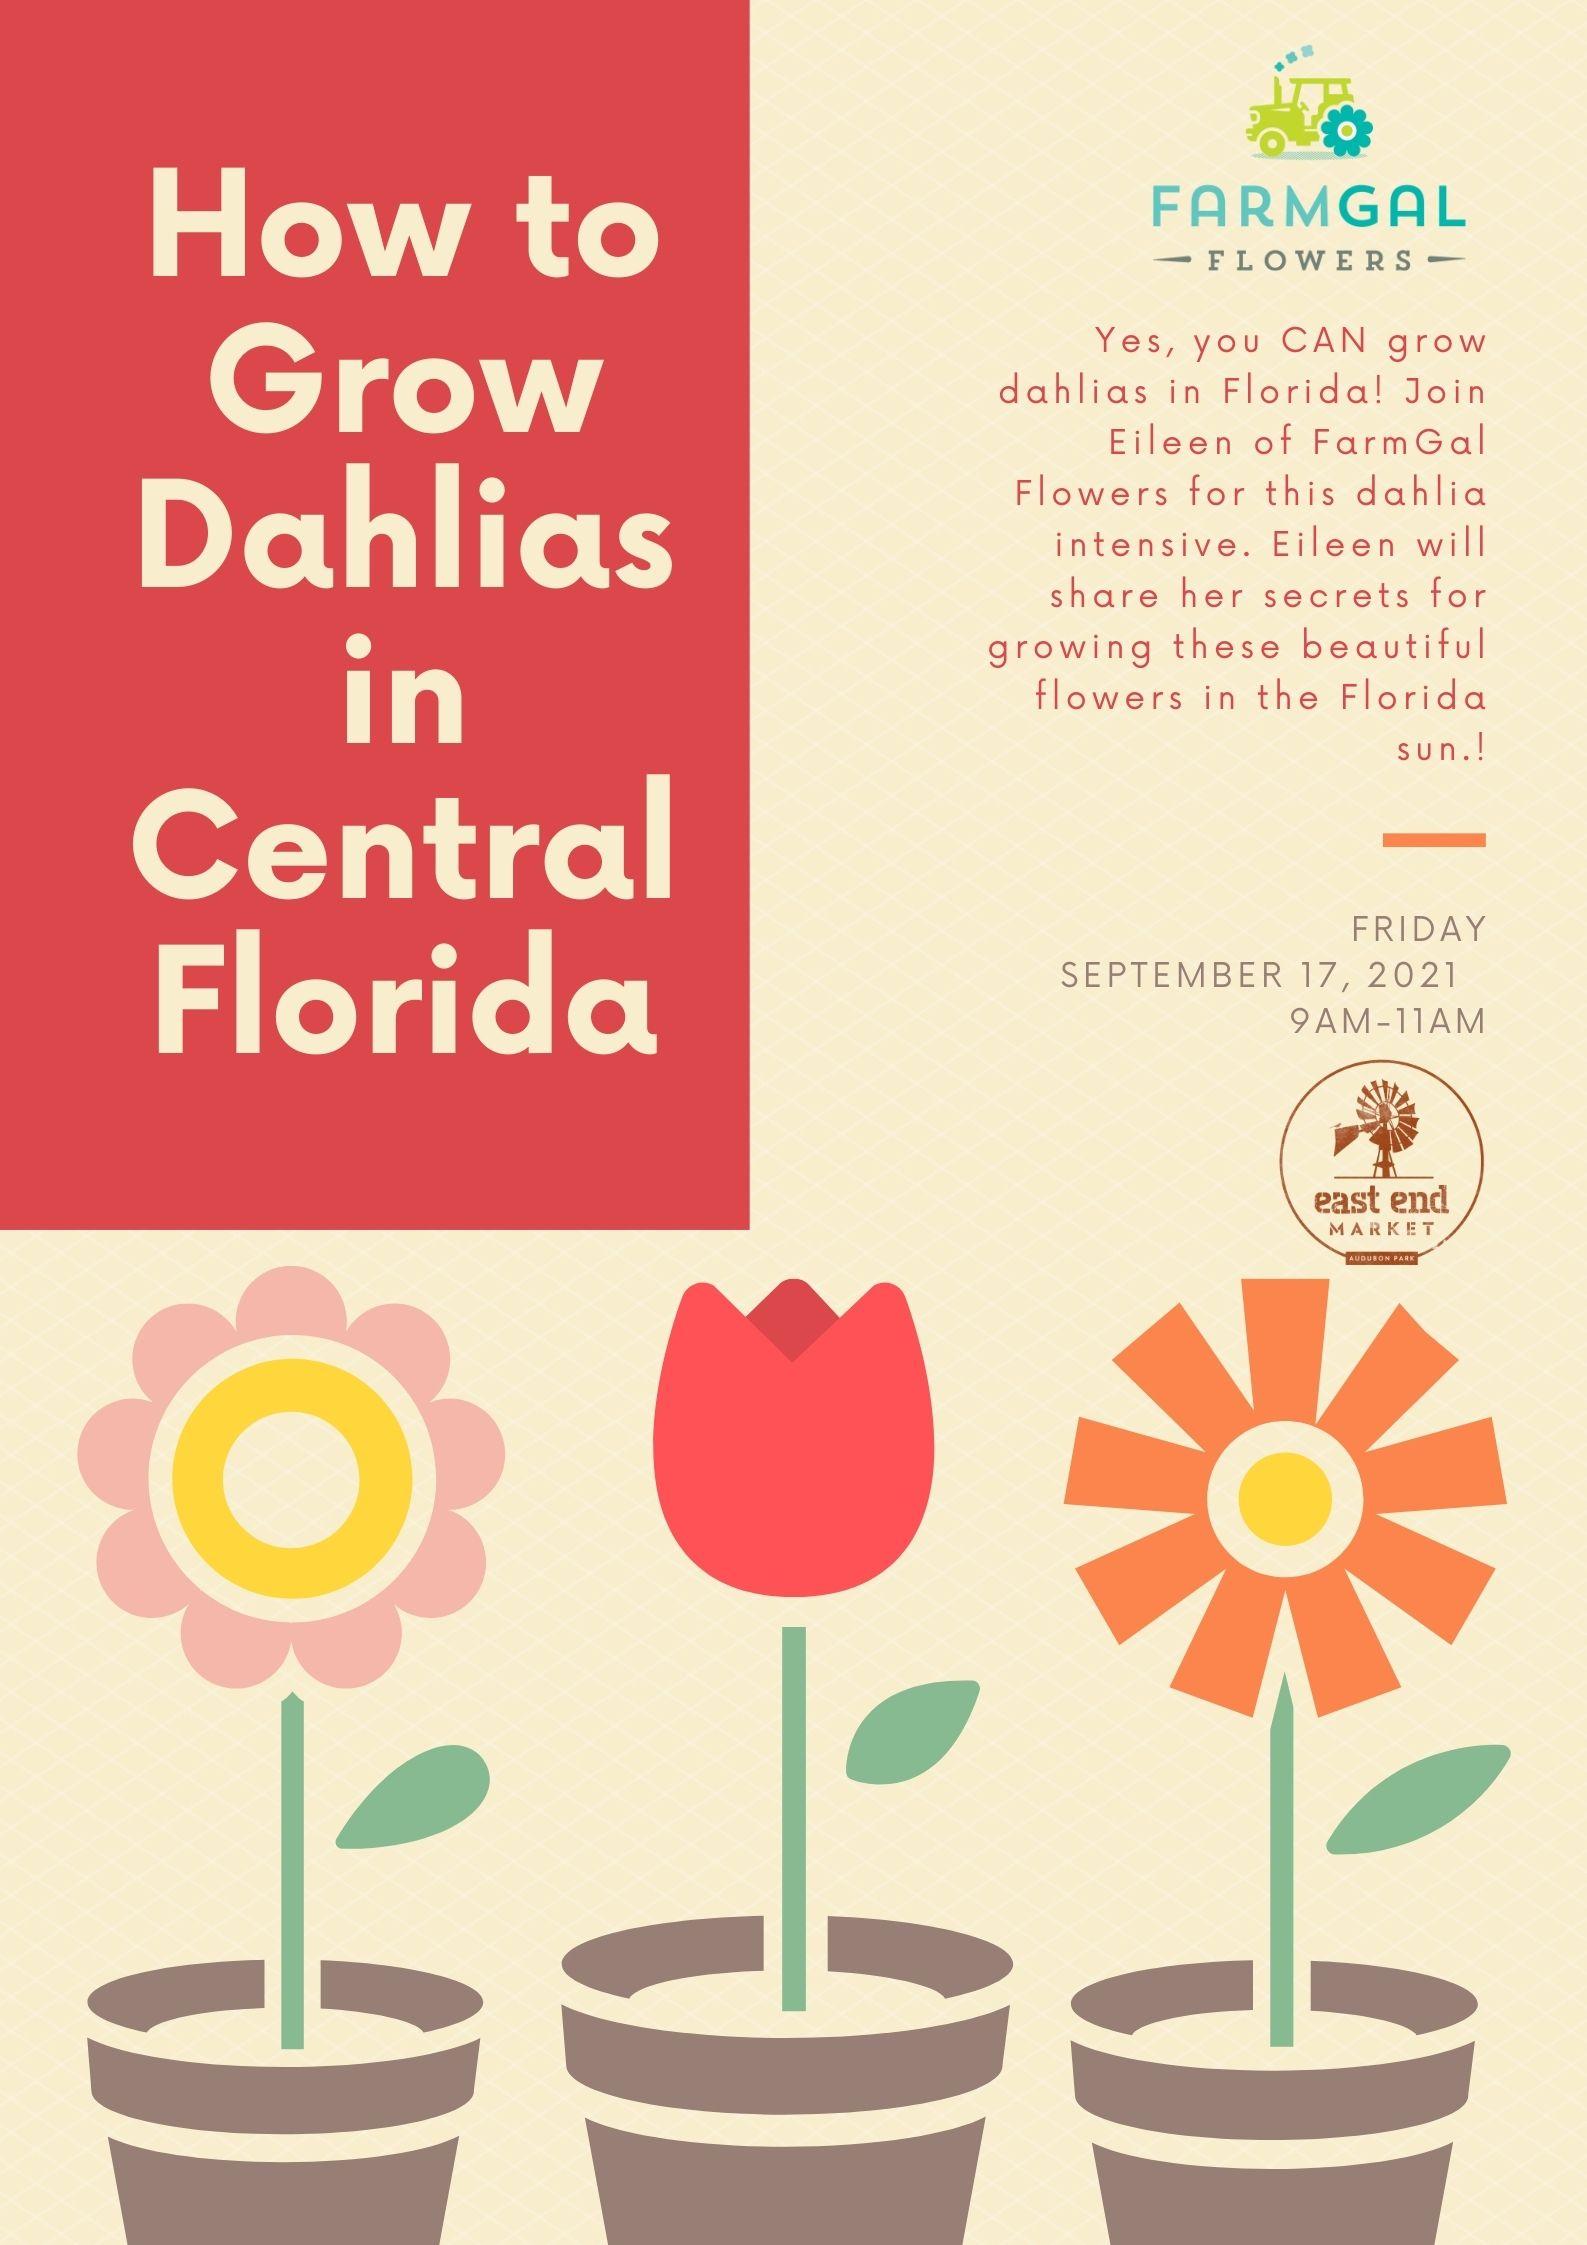 How to Grow Dahlias in Central Florida